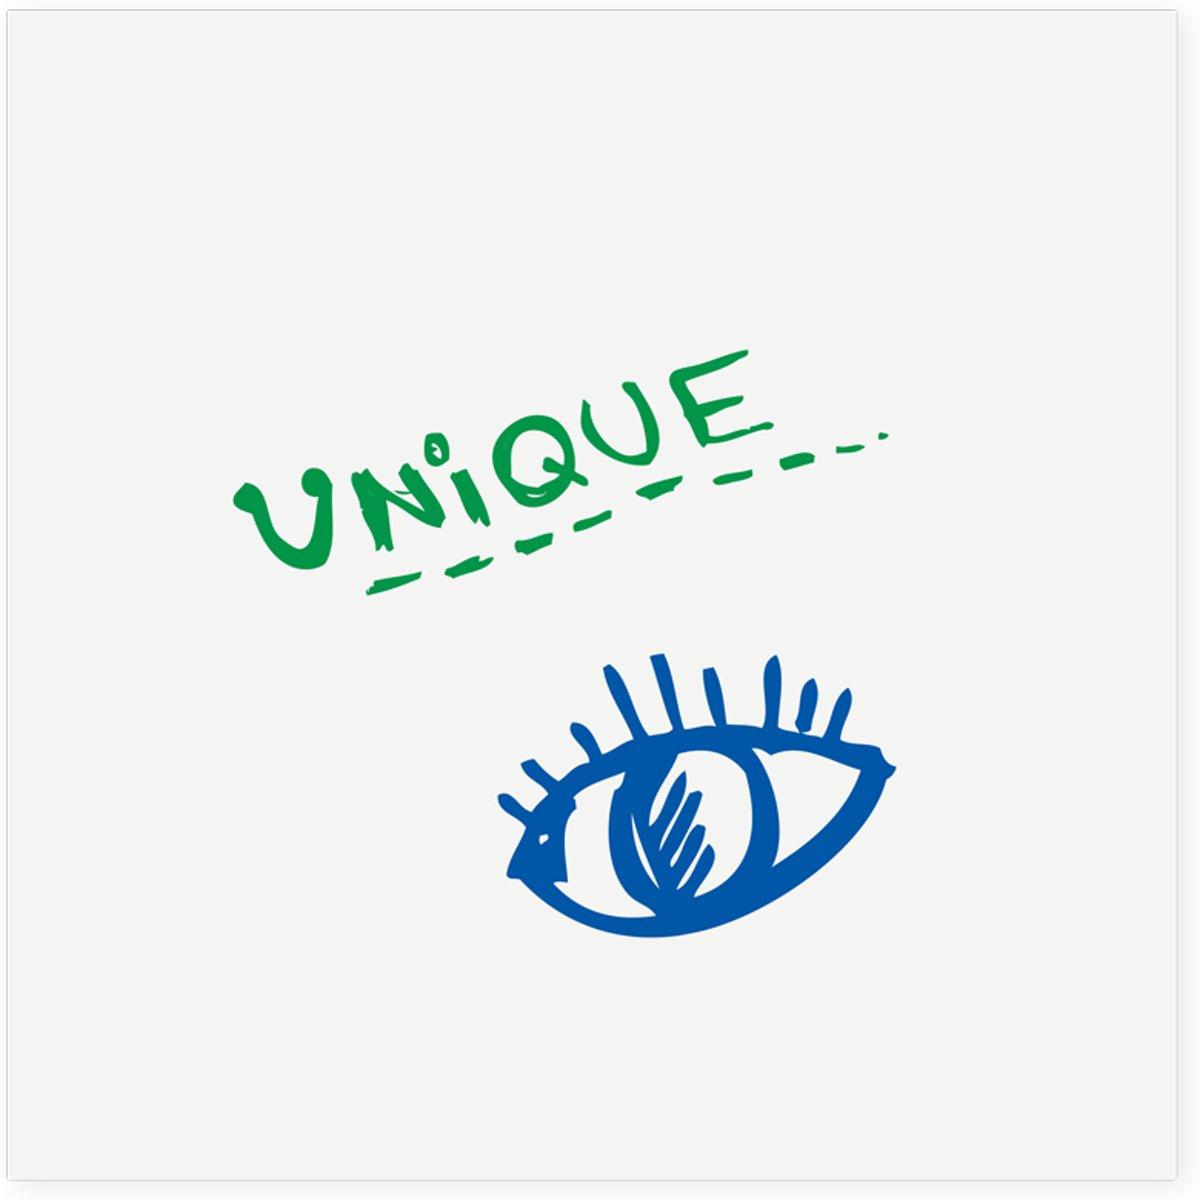 https   www.bol.com nl p canvas-schilderij-vierkant-groen-geel ... 0ec4292ba1e